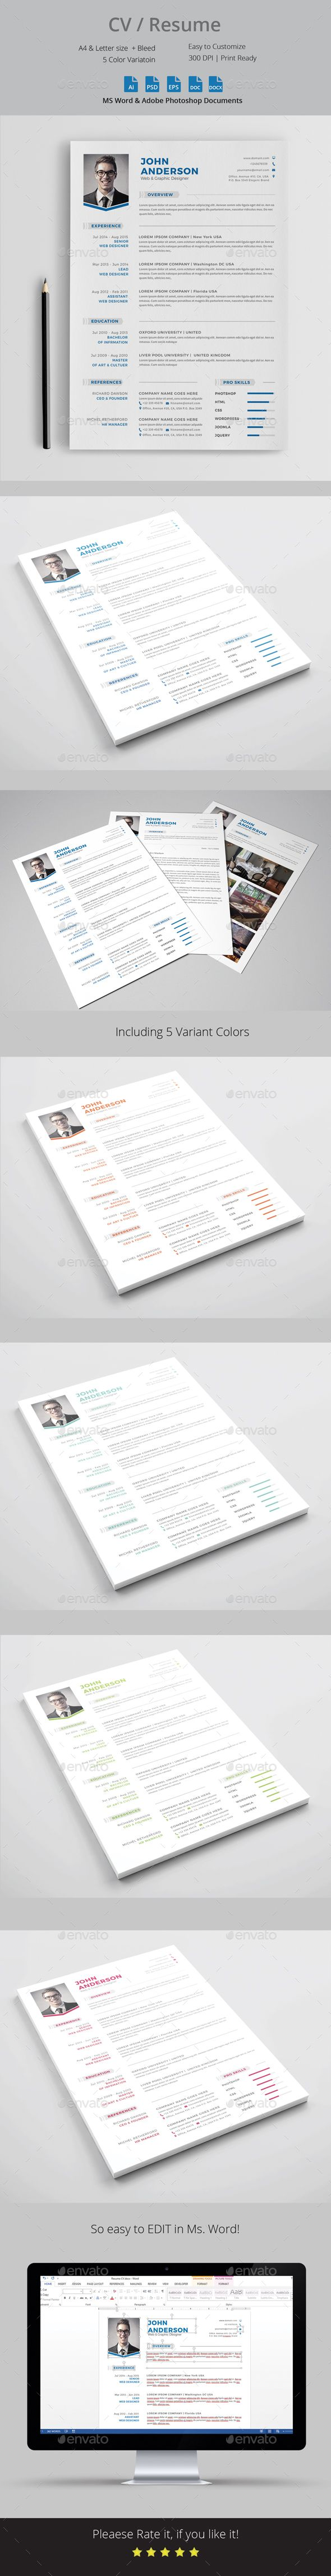 CV Resume Template CV Resume Template